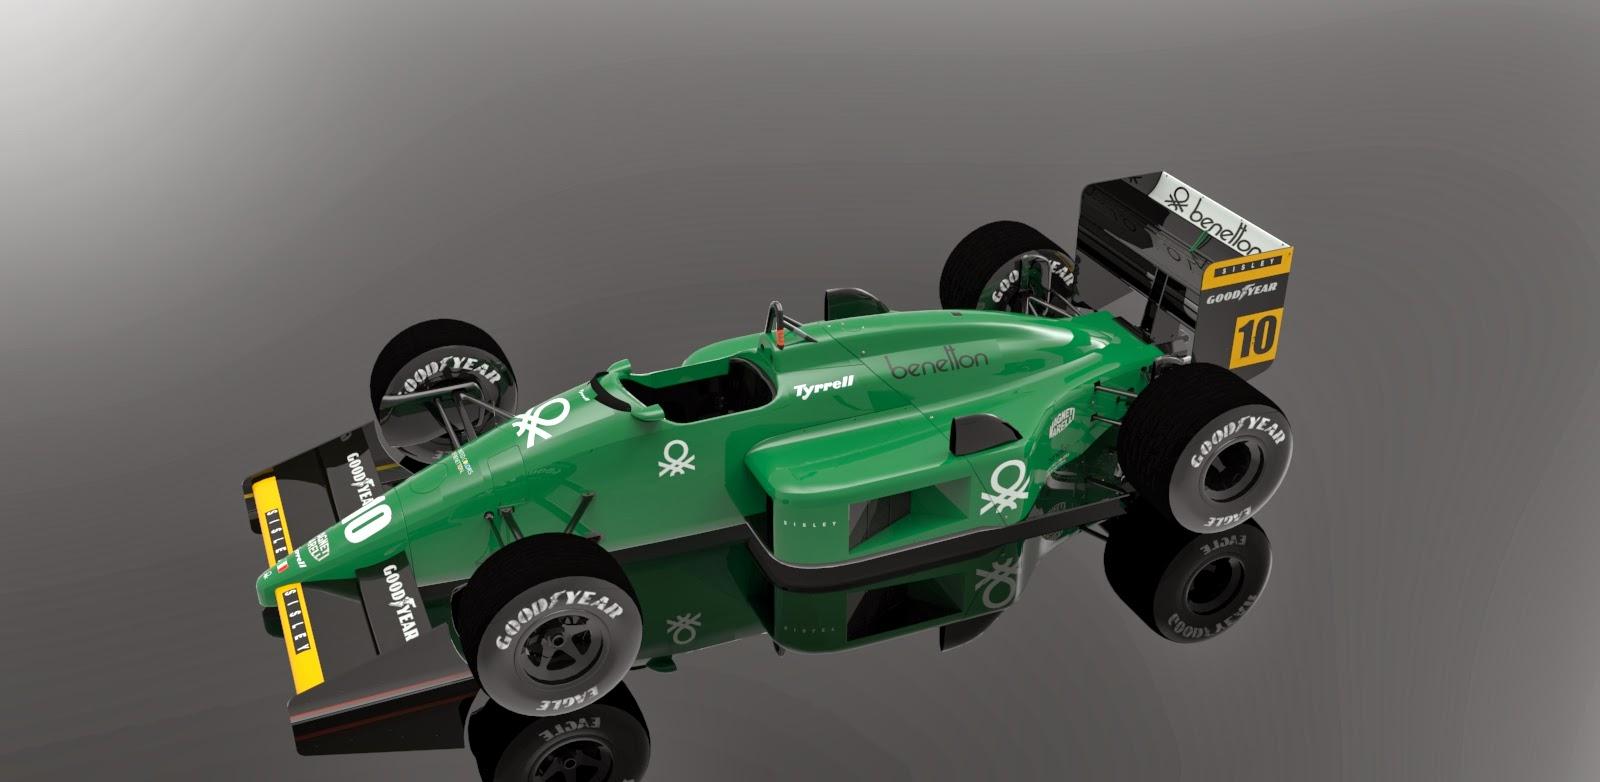 Amazoncom LEGO Ferrari F1 Racers 8123 Toys amp Games